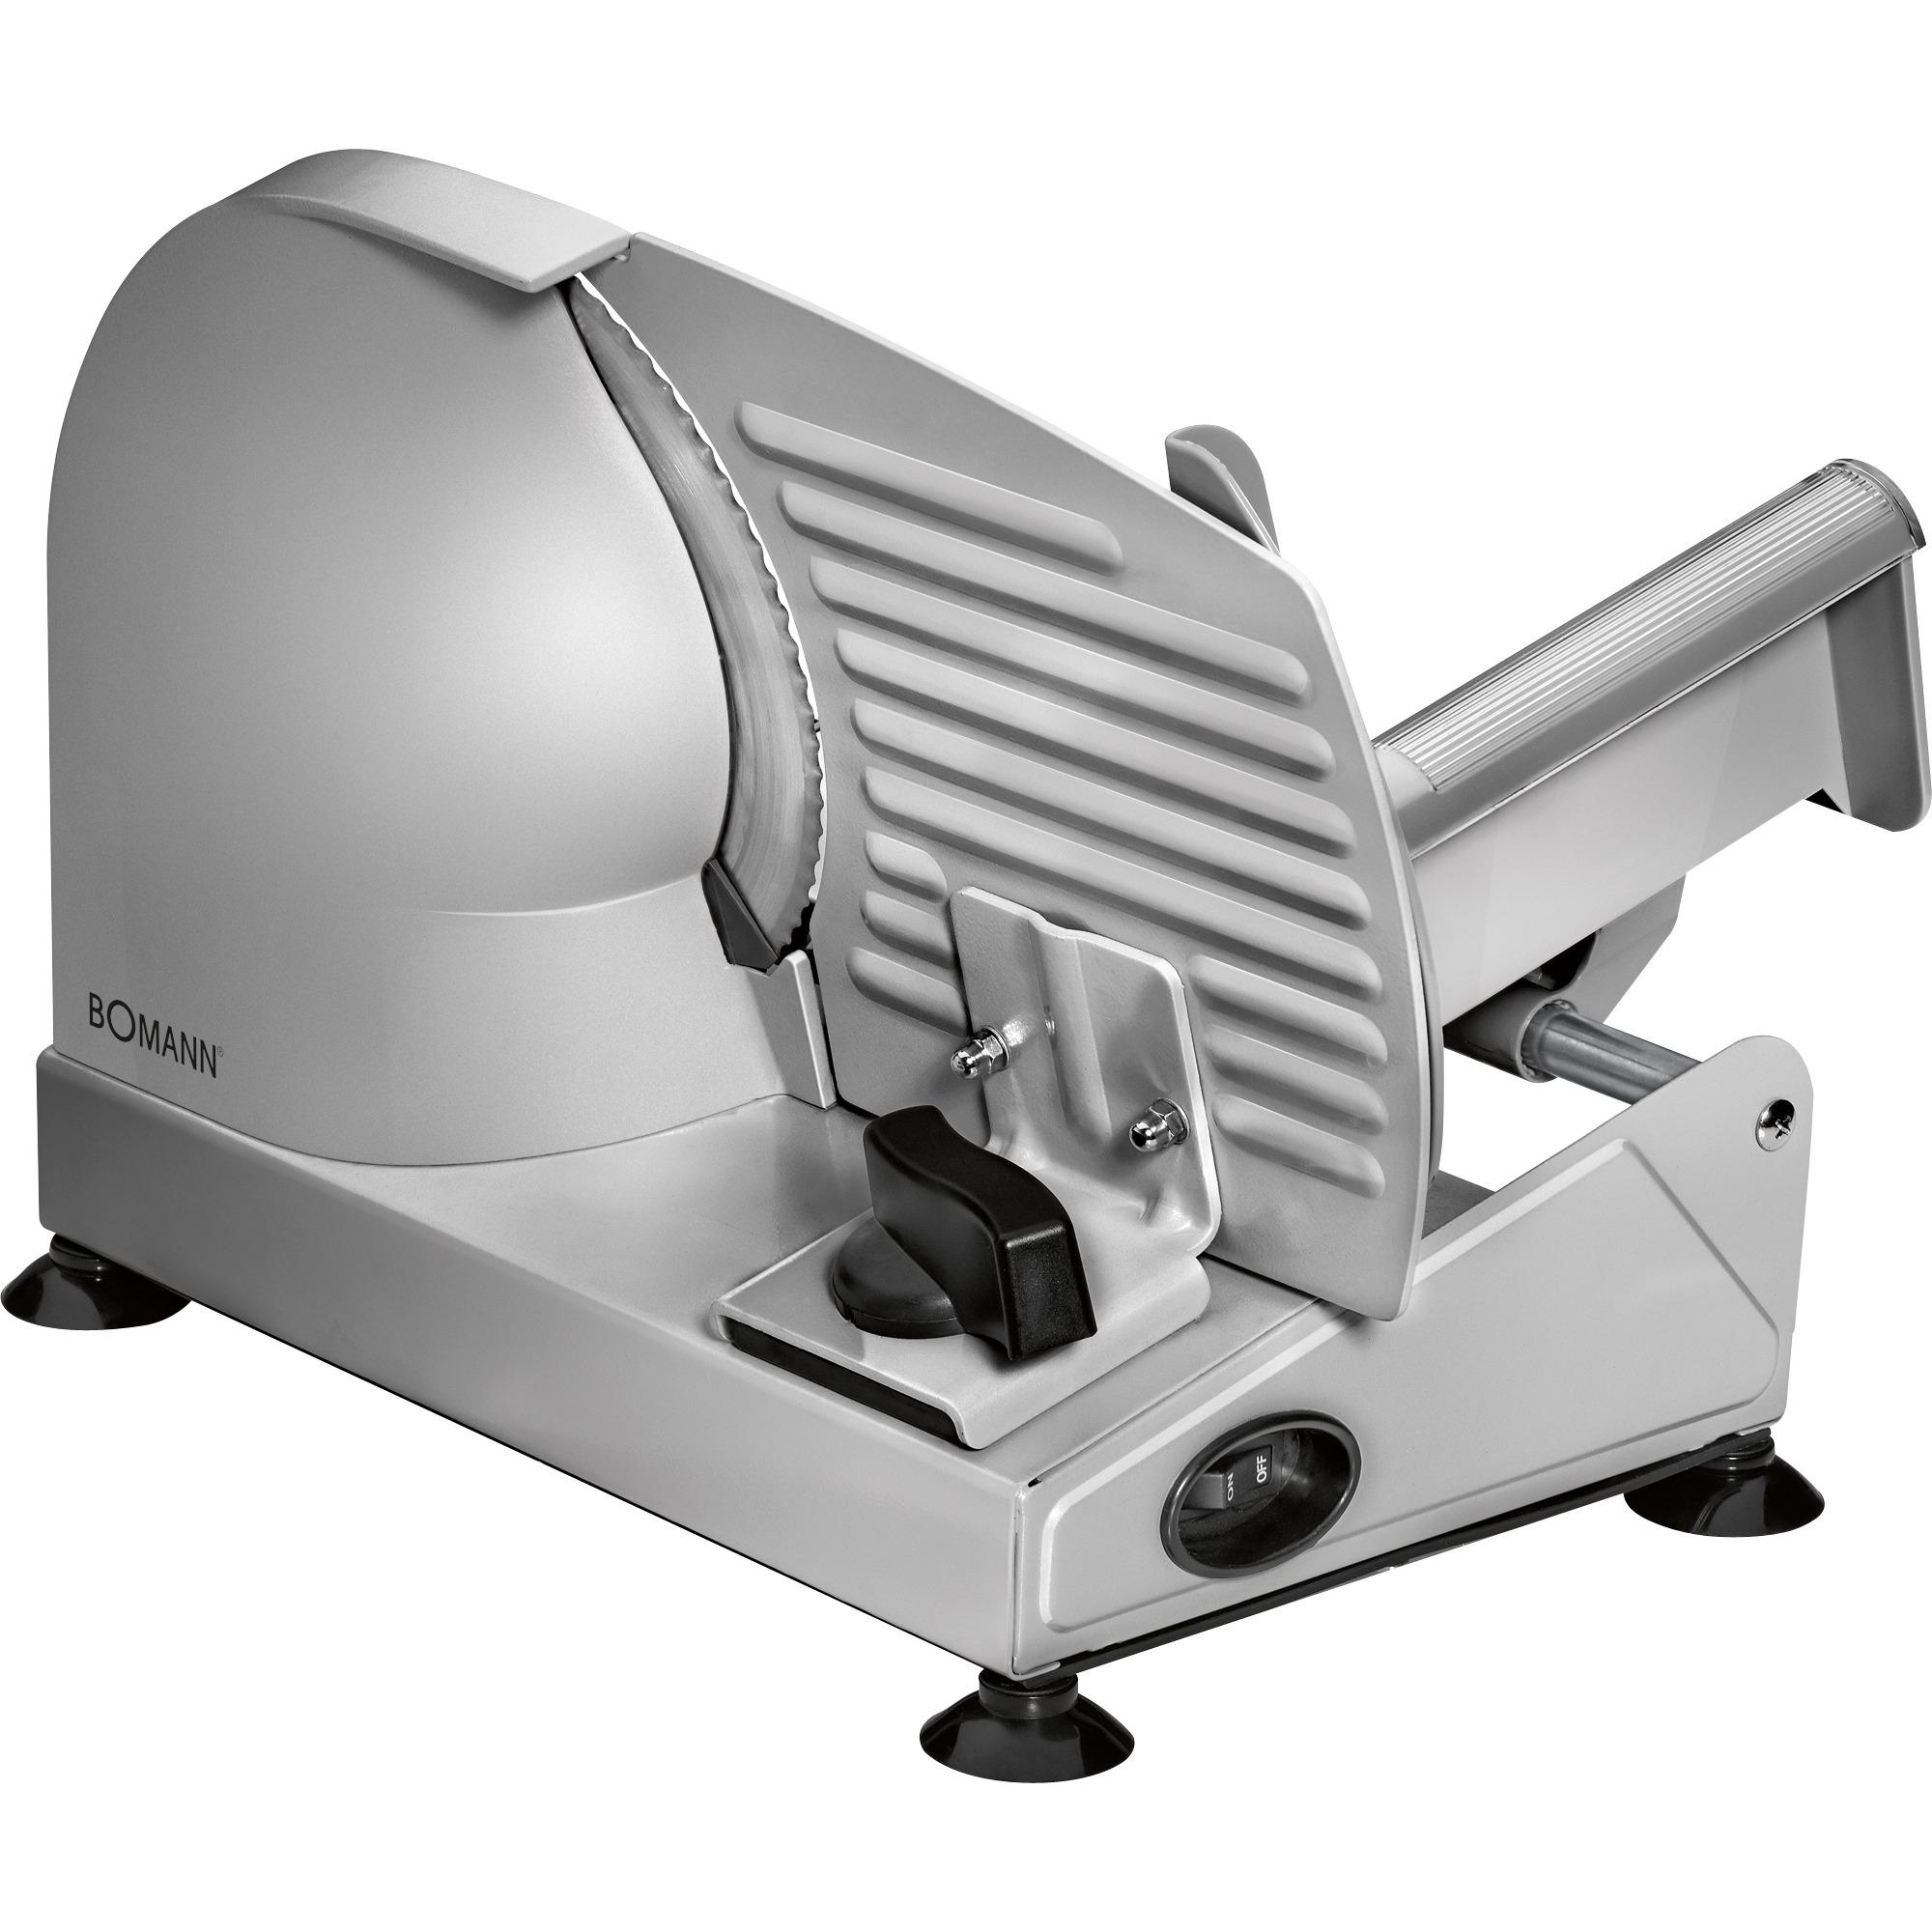 MA 451 CB rebanadora Eléctrico Plata Aluminio 150 W, Cortatodo